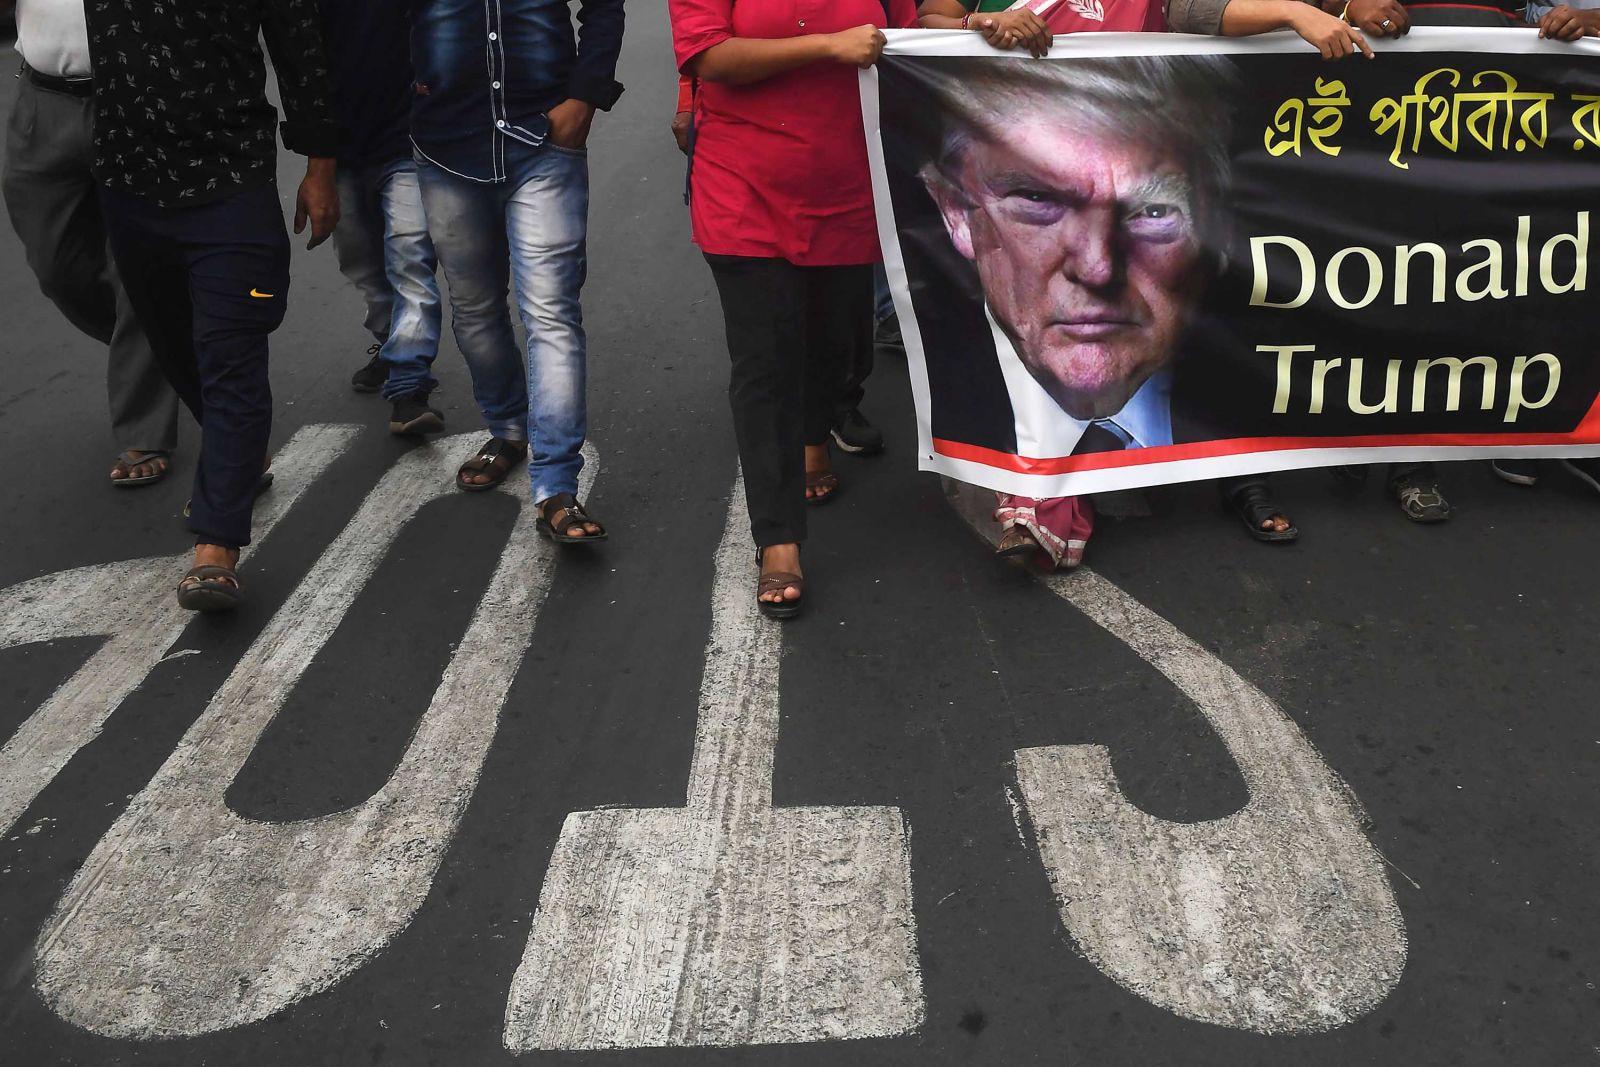 https://dynaimage.cdn.cnn.com/cnn/w_1600/https%3A%2F%2Fcdn.cnn.com%2Fcnnnext%2Fdam%2Fassets%2F200224165833-01-trump-protest-india-0224-kolkata.jpg